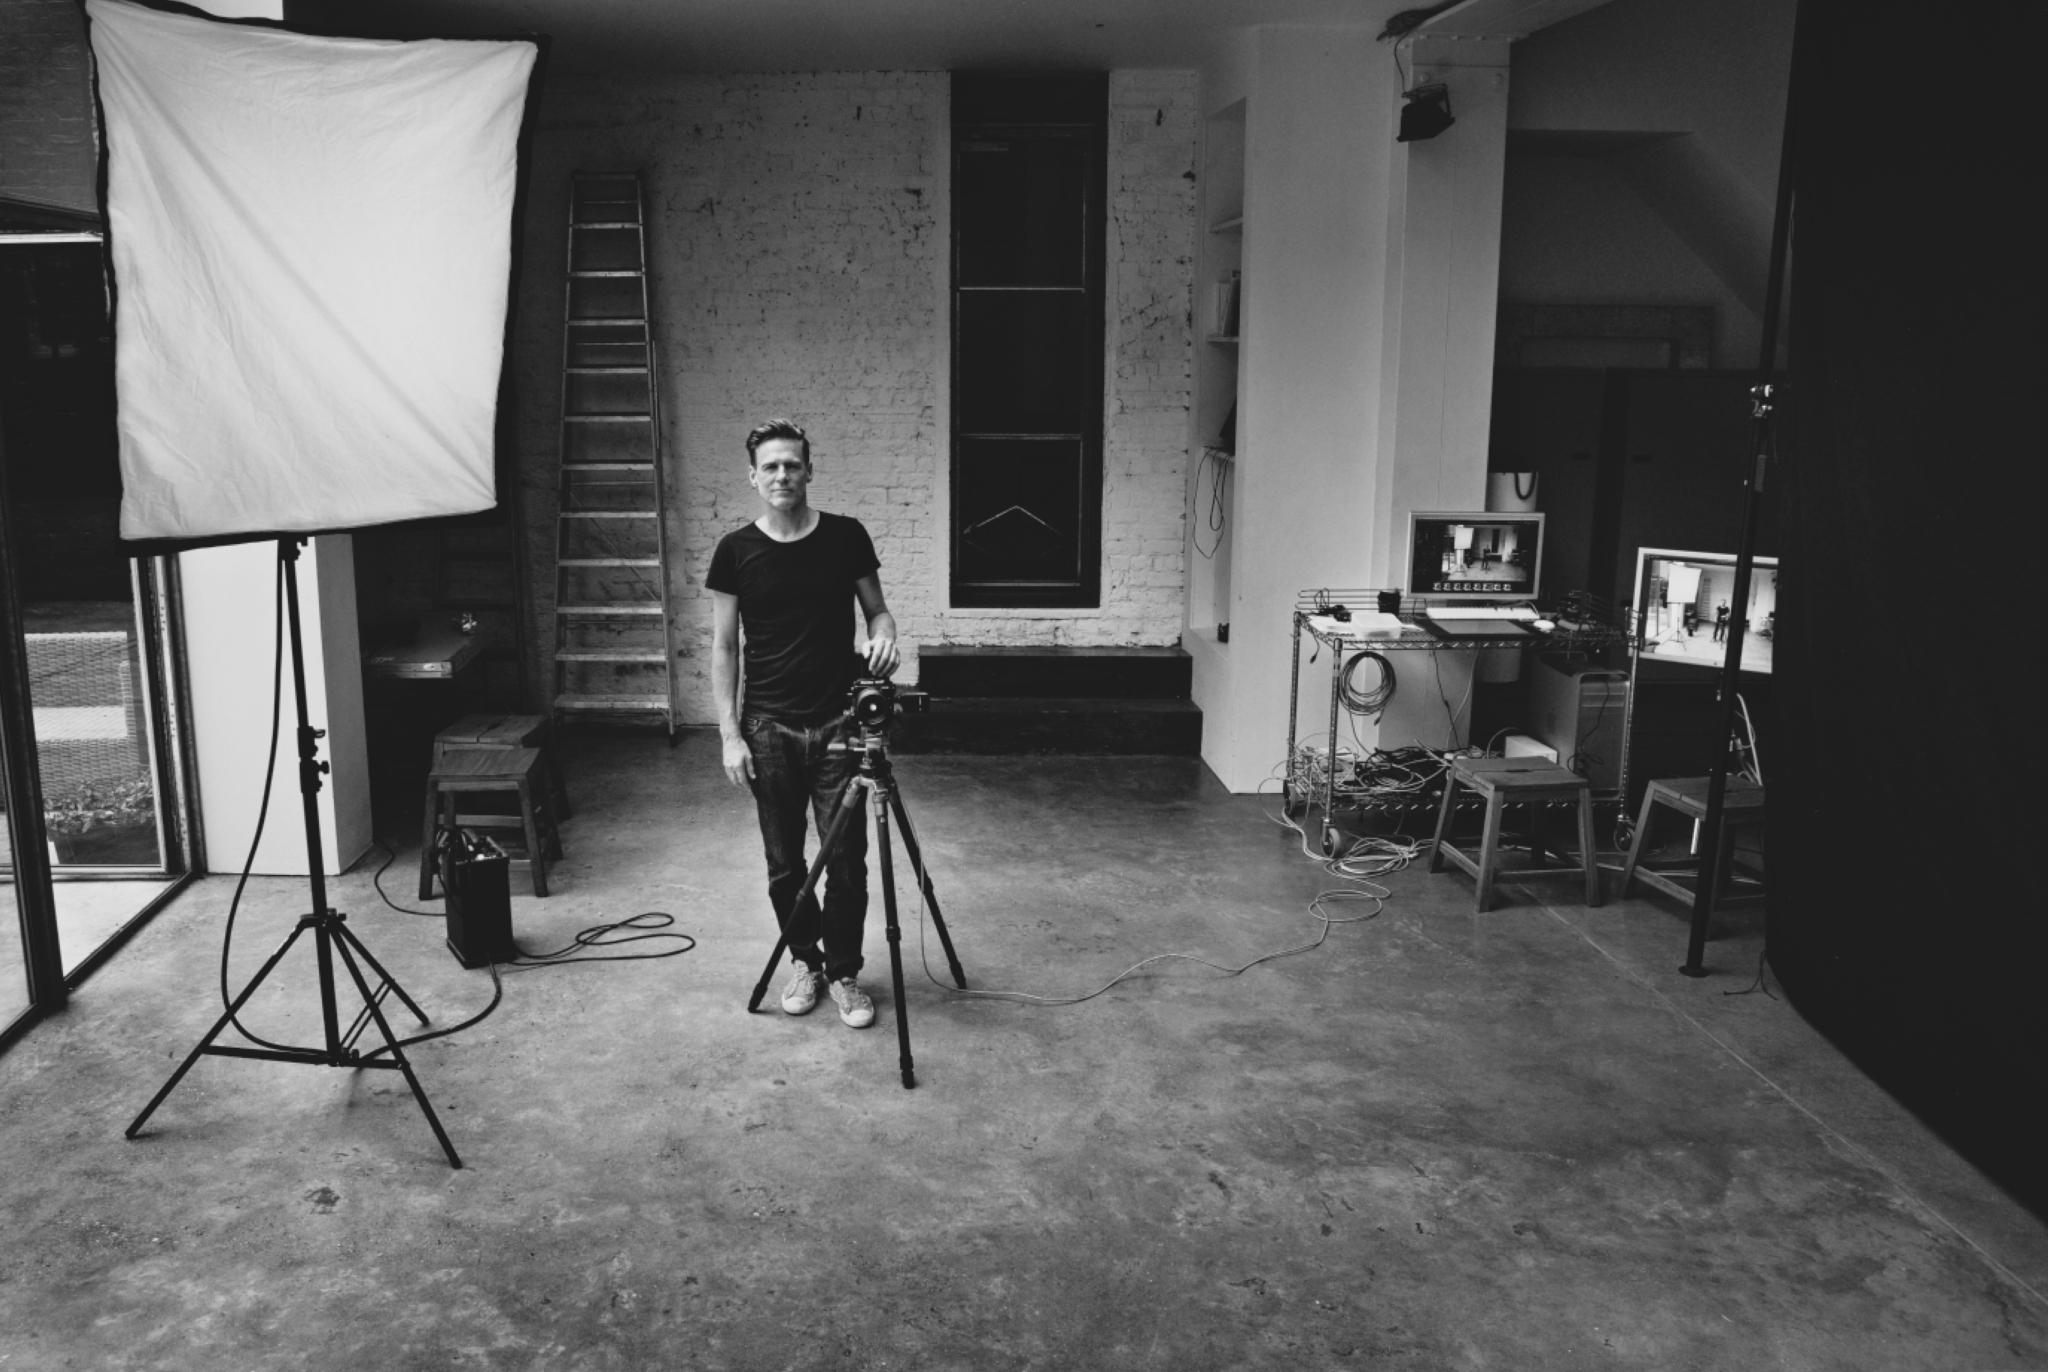 Bryan Adams the photographer in return of the Pirelli Calendar